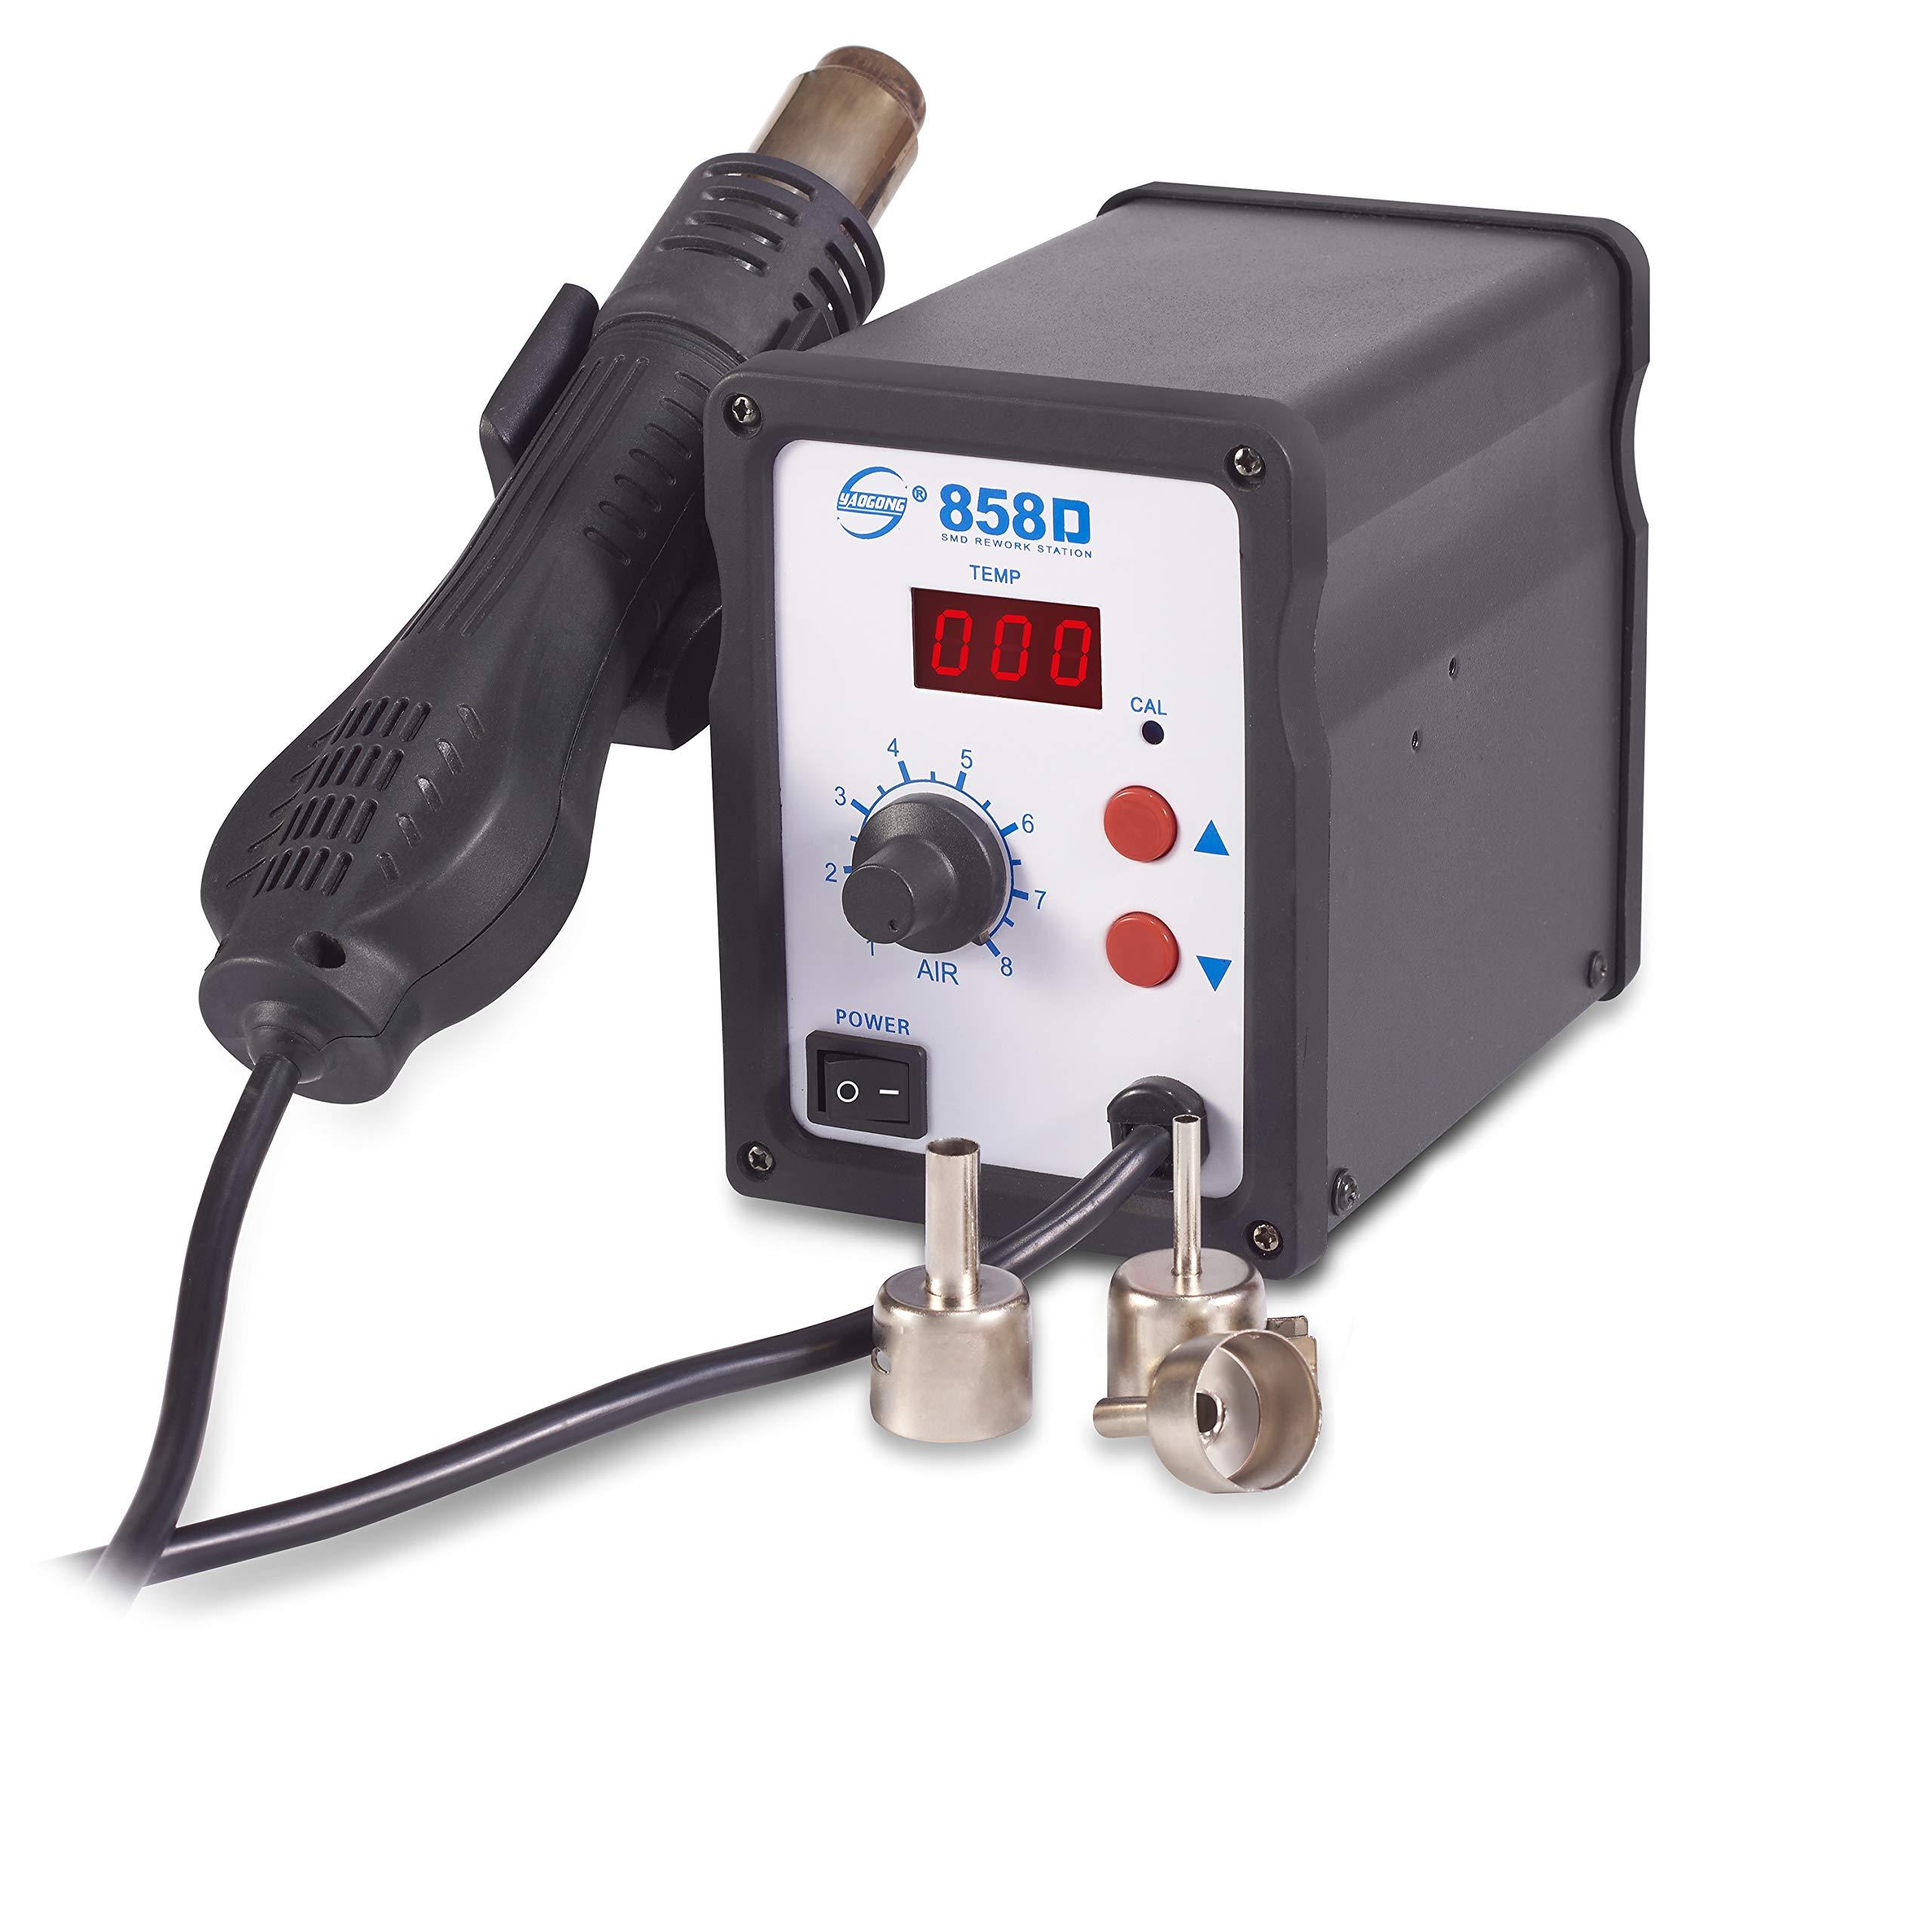 858D SMD Digital Soldering  Hot Air Gun  Iron Desoldering Rework Station 700W !